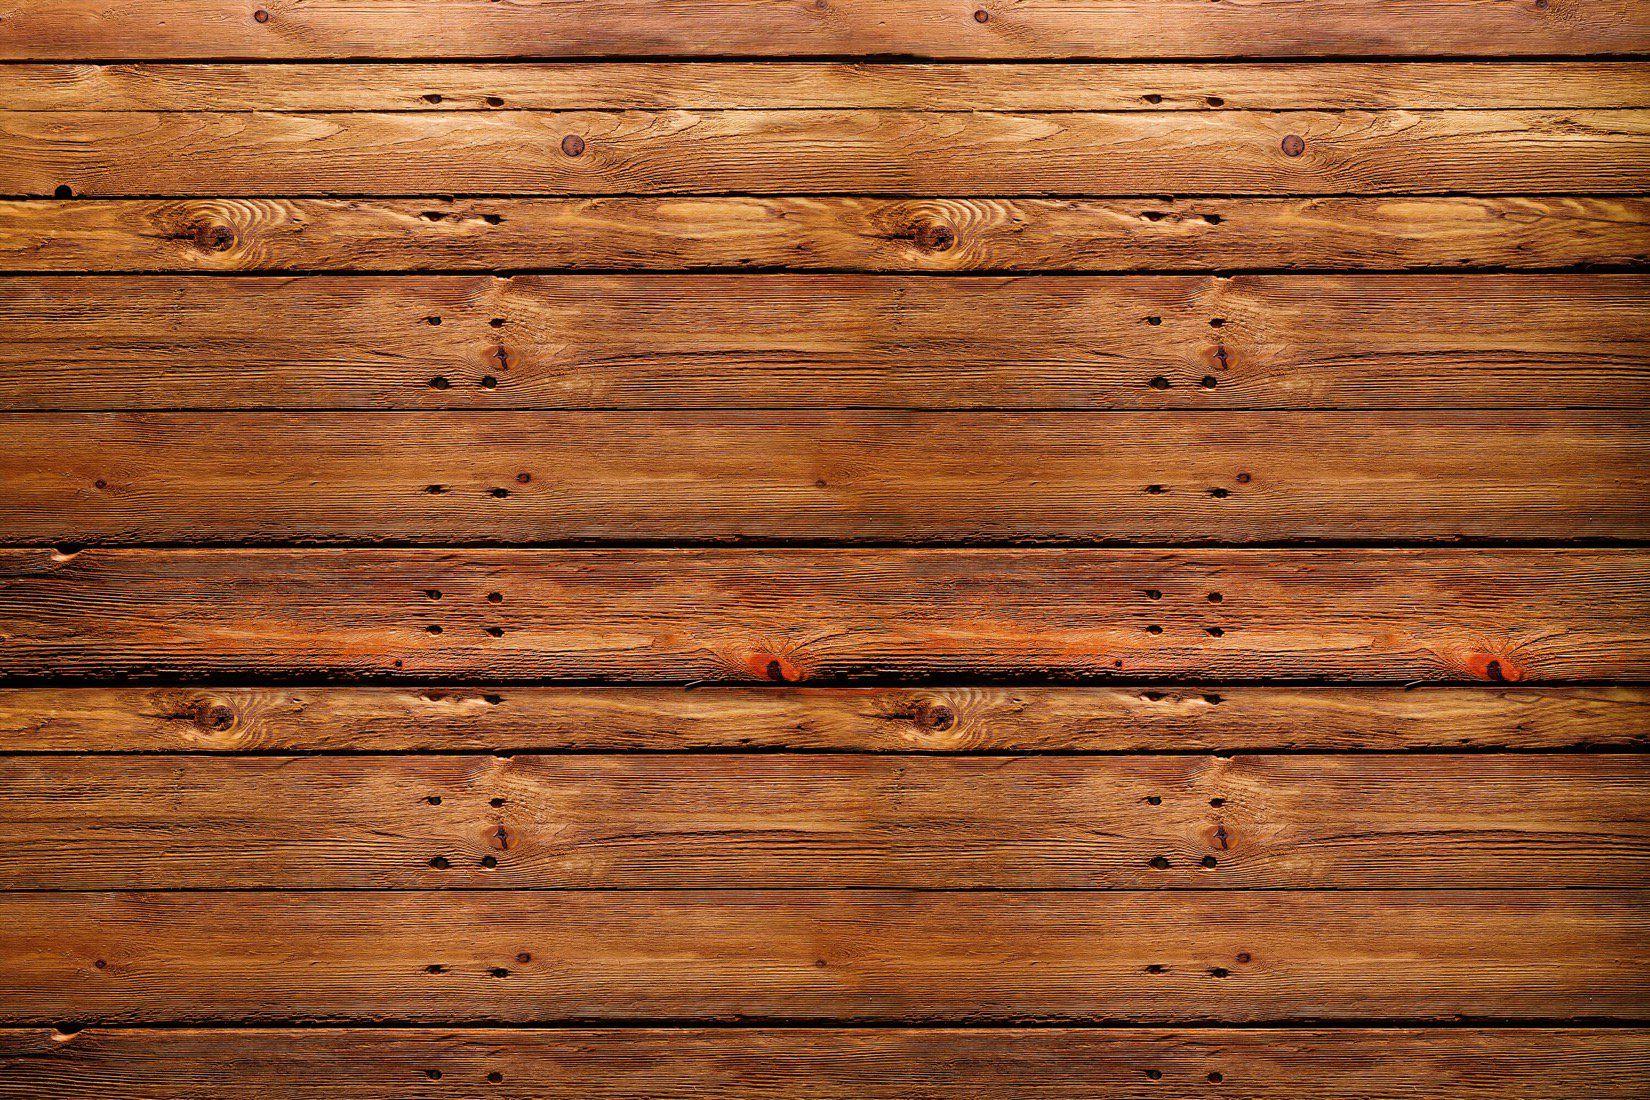 Wood Cabin Wallpaper Mural Murals Wallpaper In 2021 Wood Texture Wood Wallpaper Wood Background